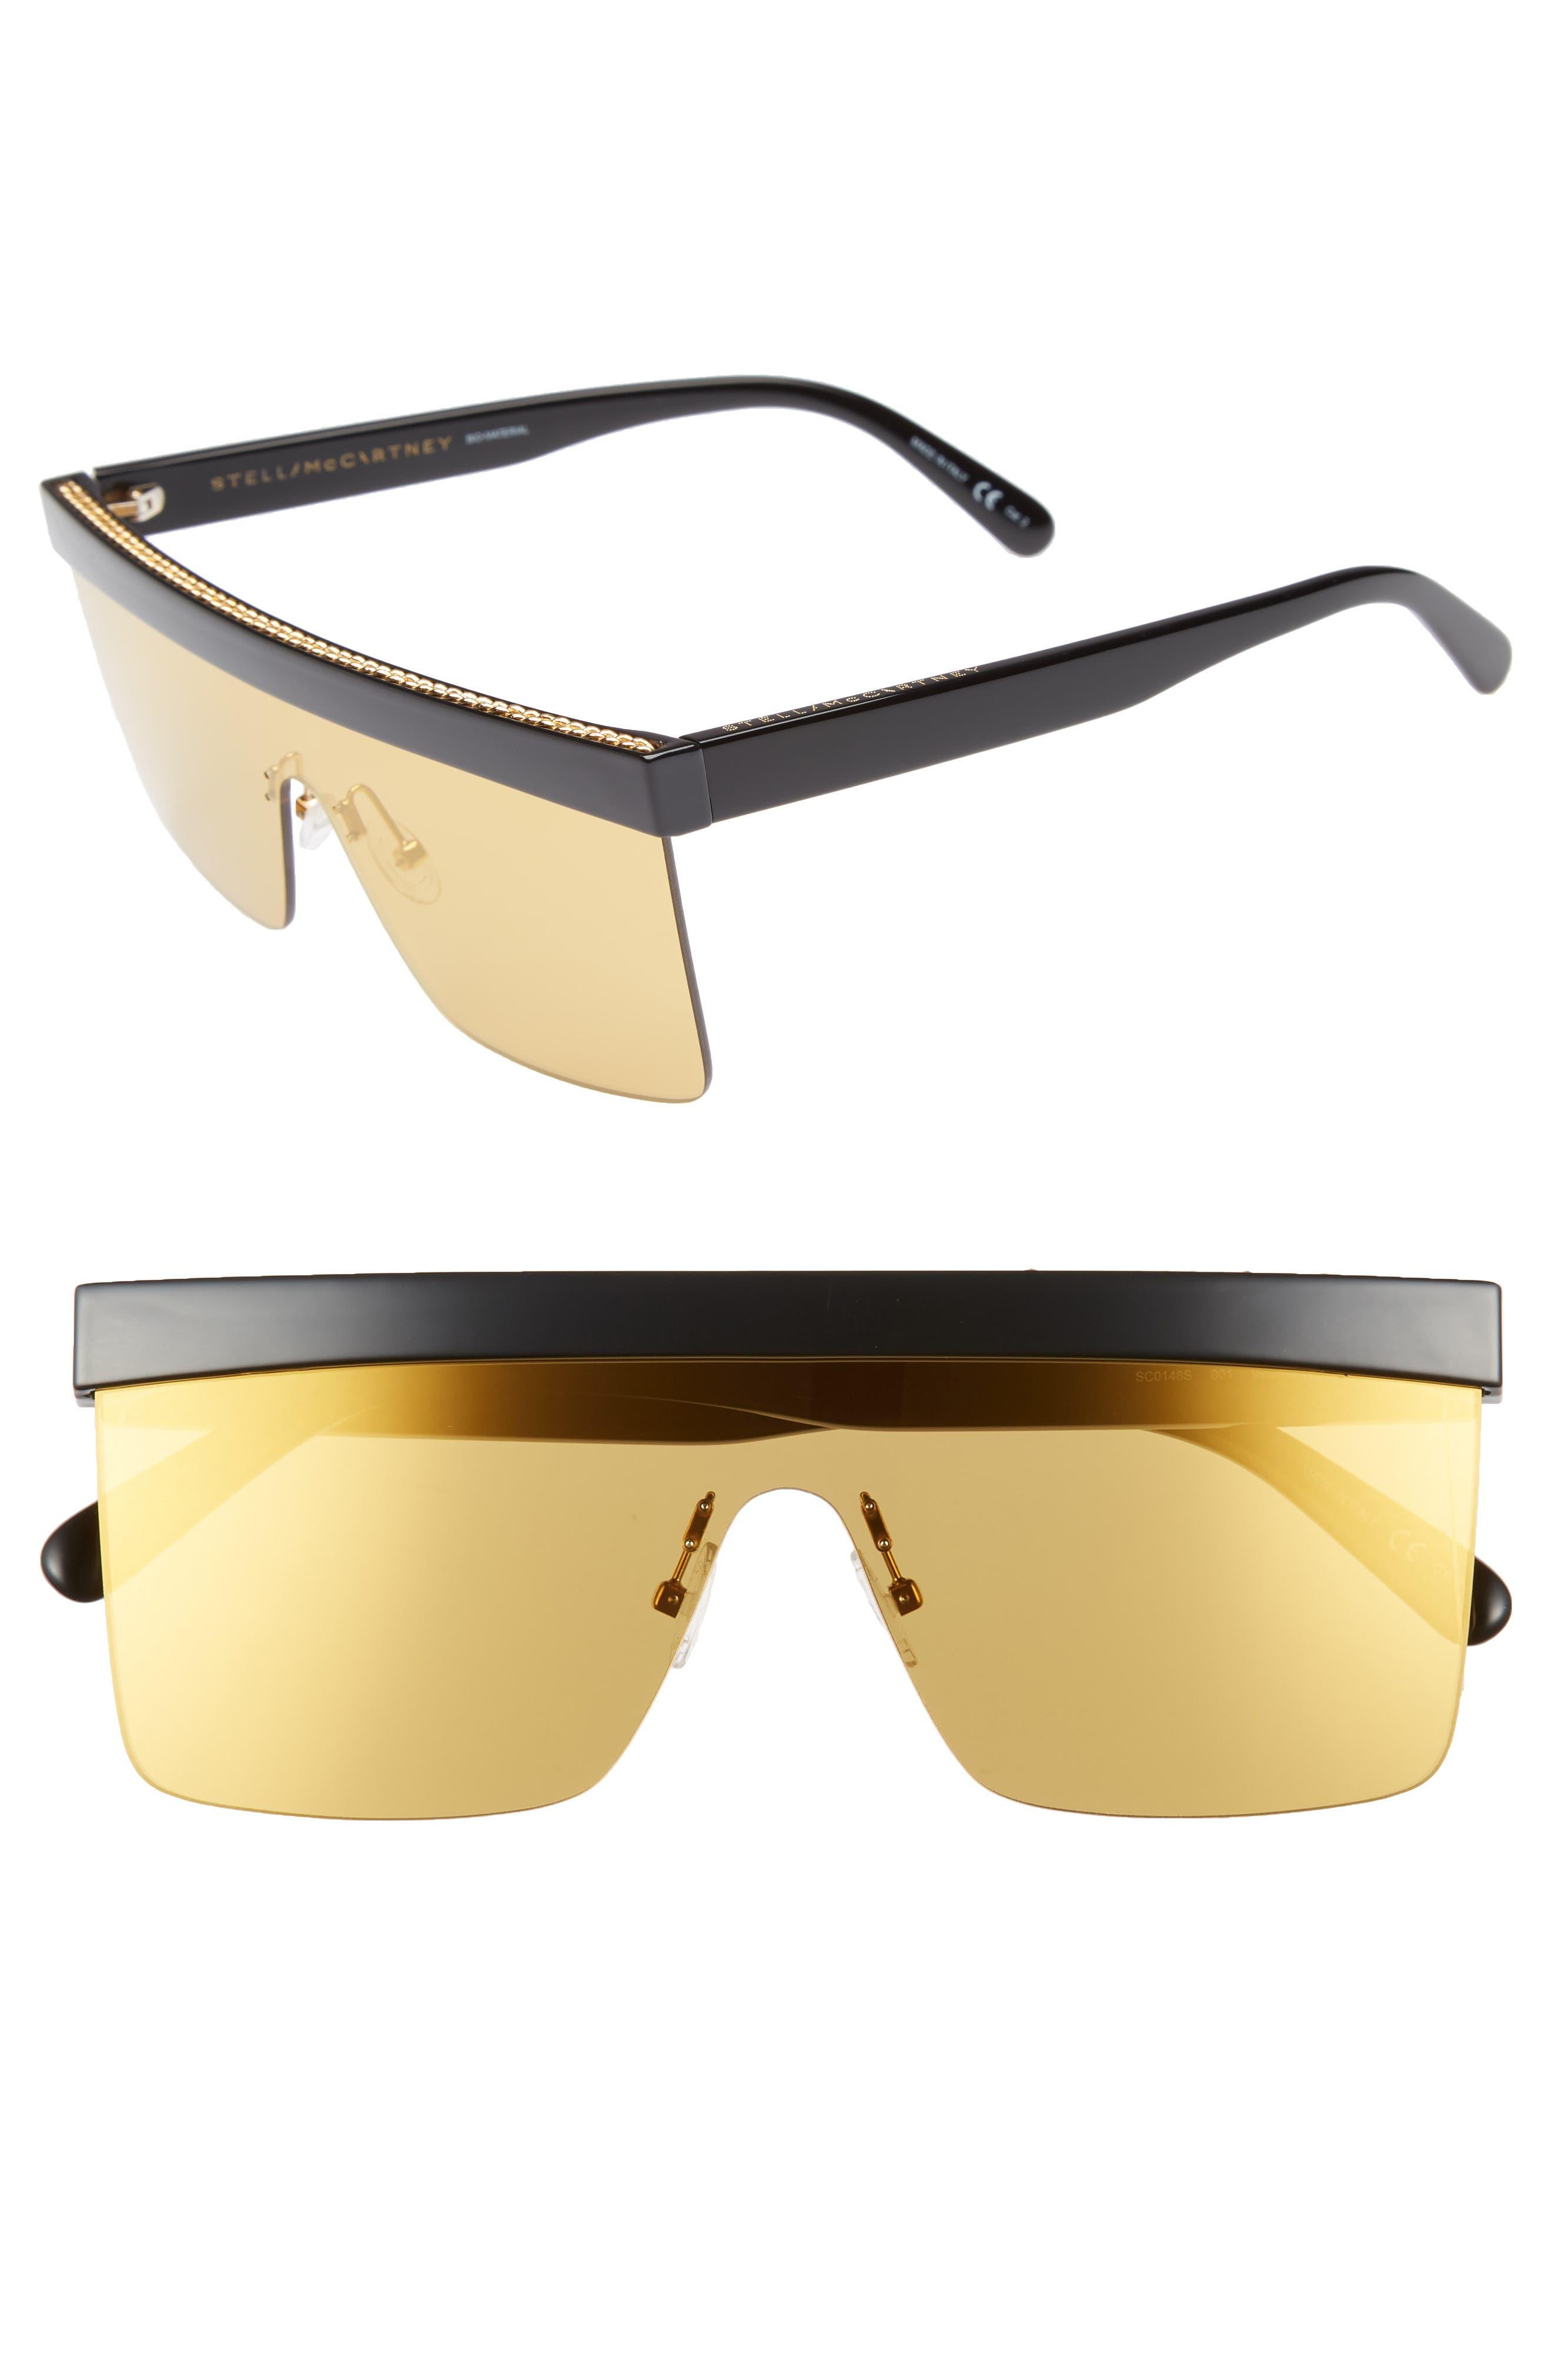 cade9b41aa Stella Mccartney Sunglasses for Women